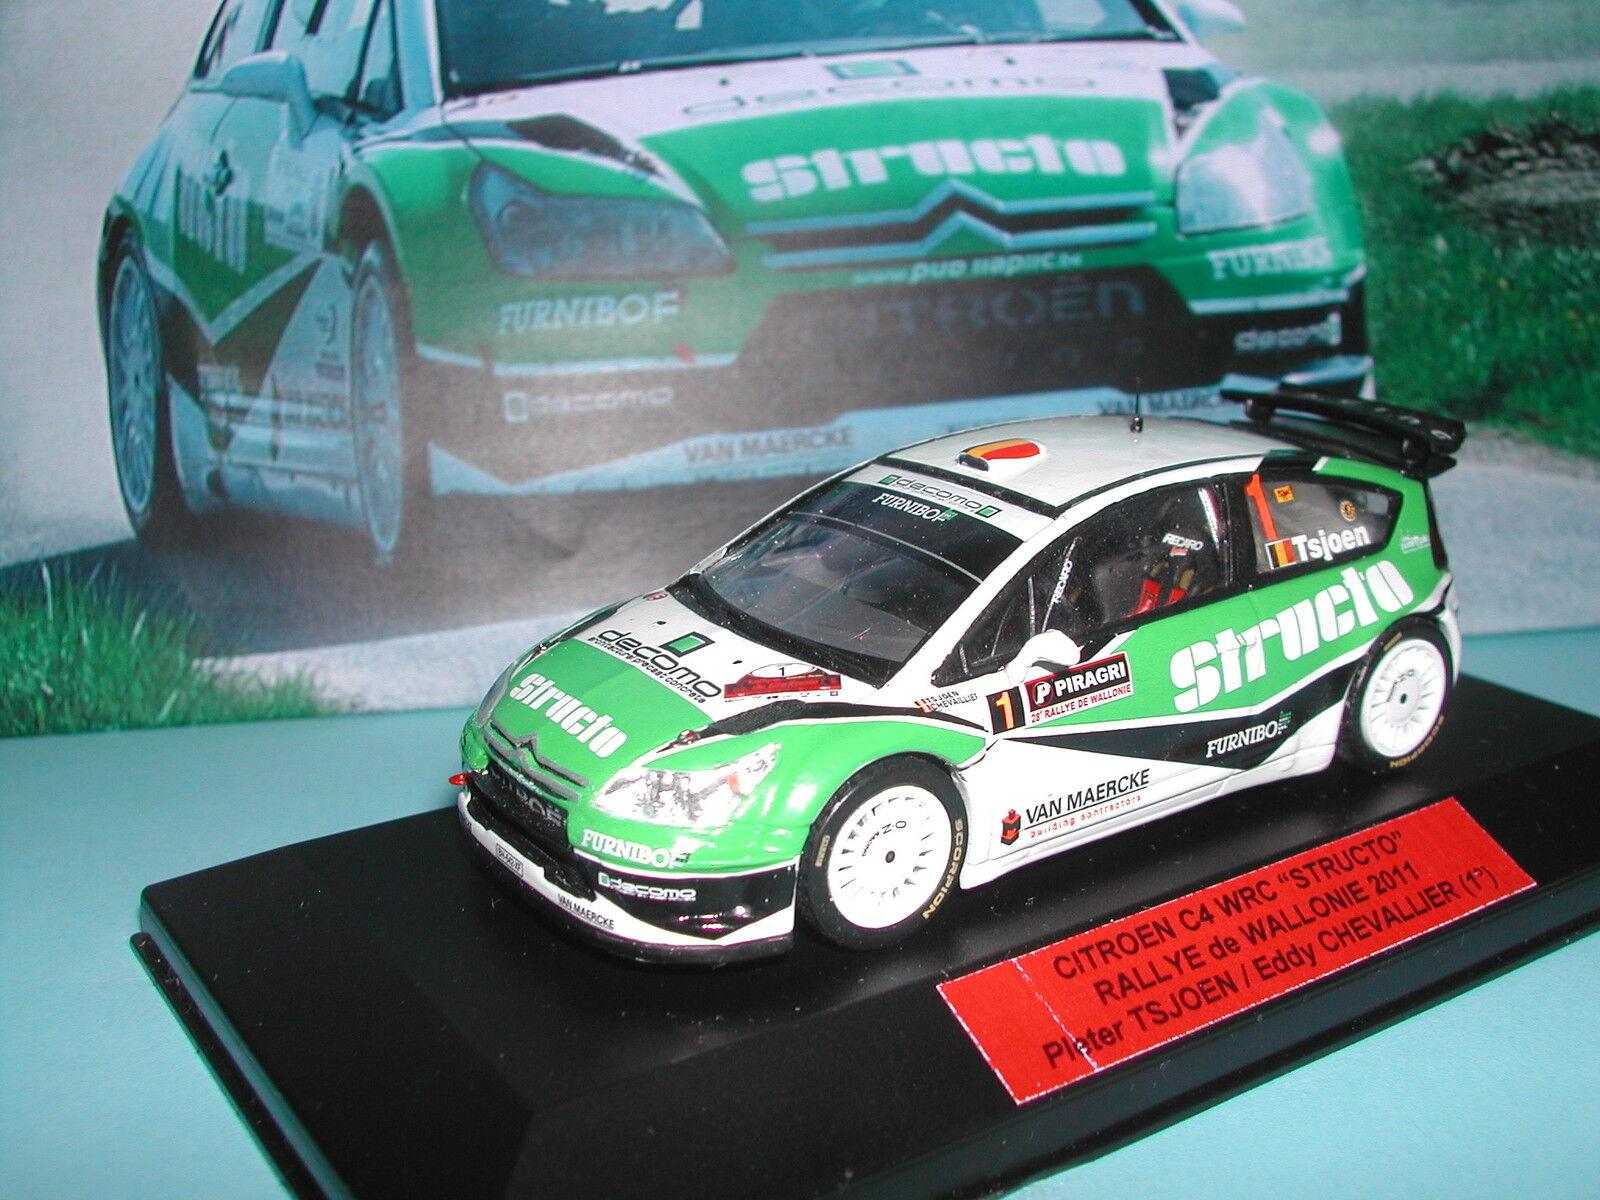 CITROEN C4 WRC TSJOEN STRUCTO WALLONIE 2011 PRO HANDBUILT IXO RENAISSANCE 1 43°